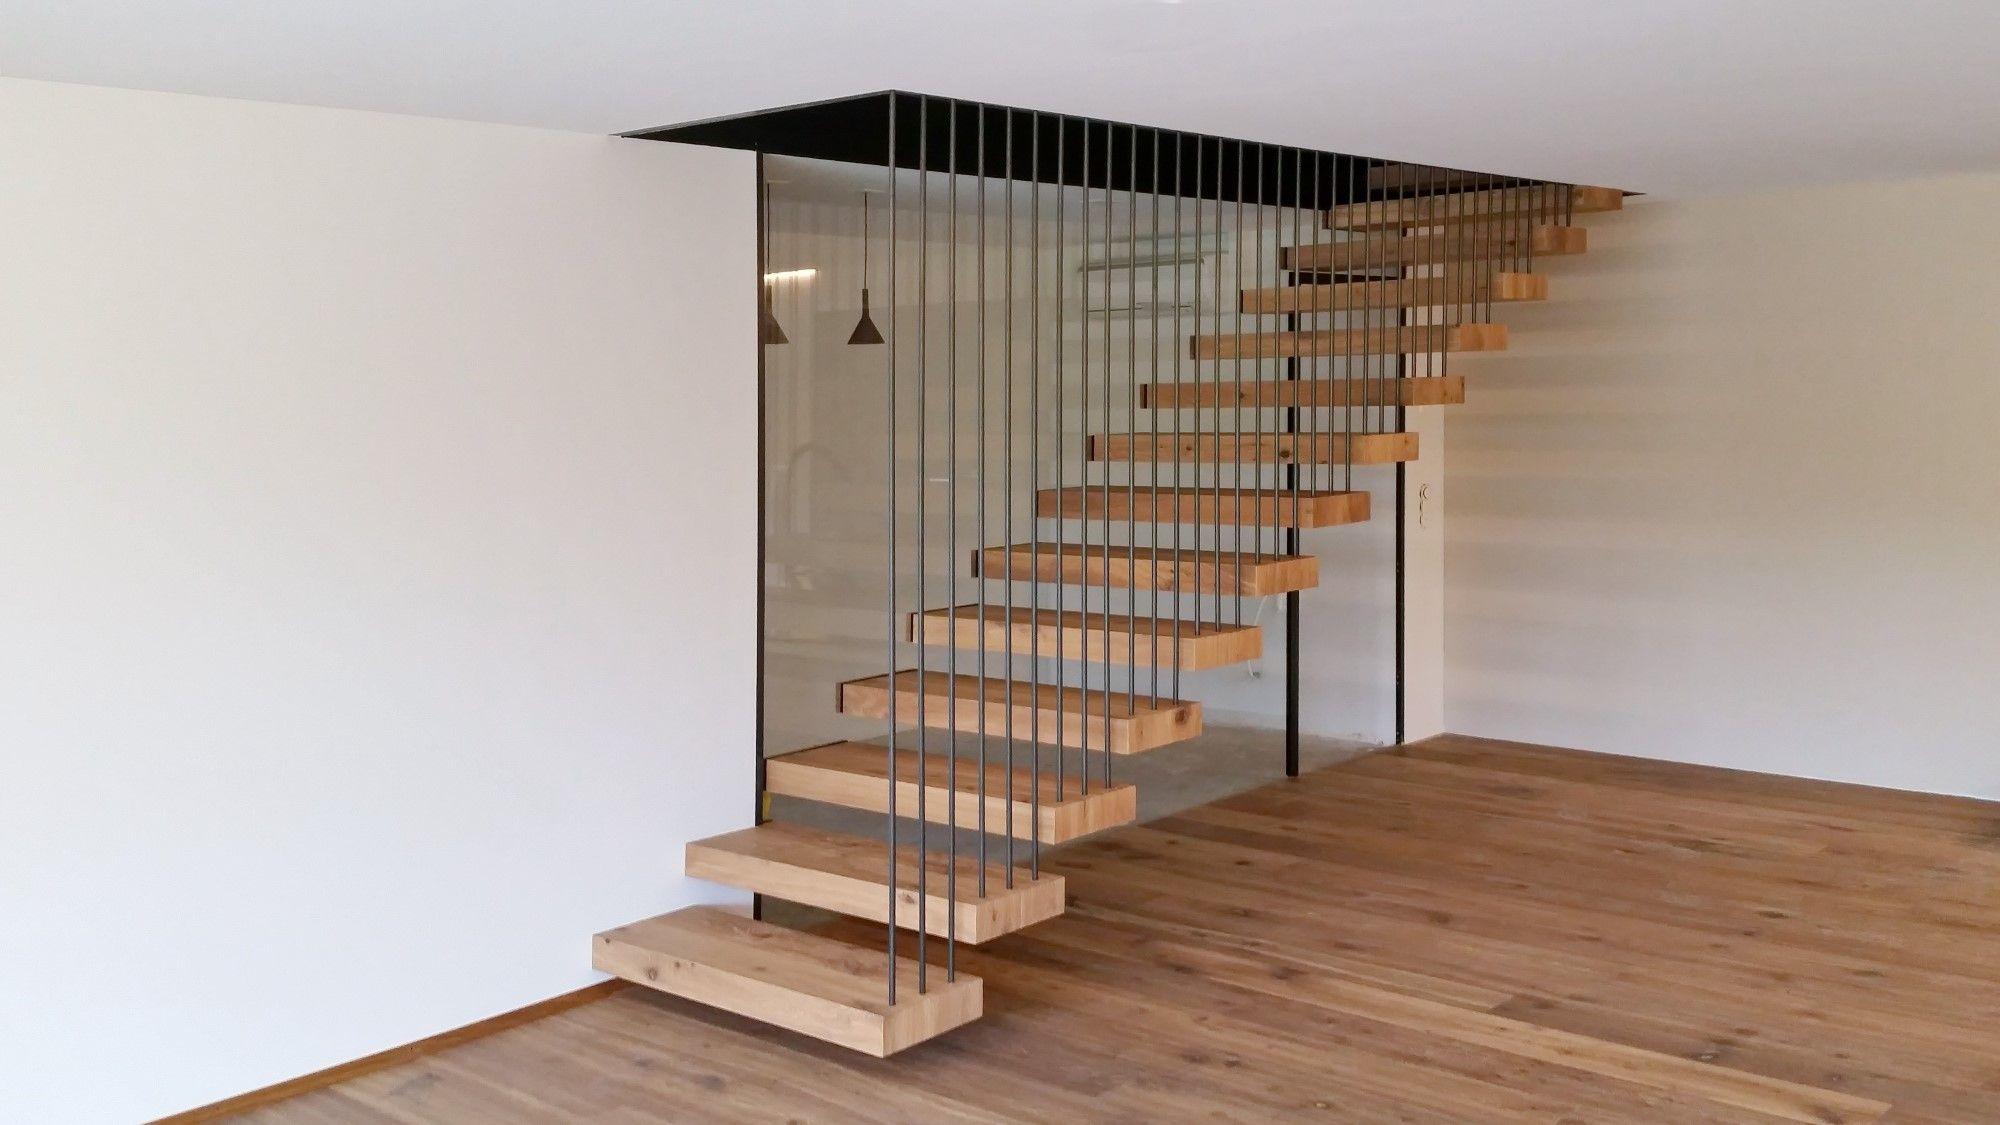 Kragstufentreppe Kragarmtreppe Aus Eichenparkett Treppe Kragarmtreppe Holztreppe